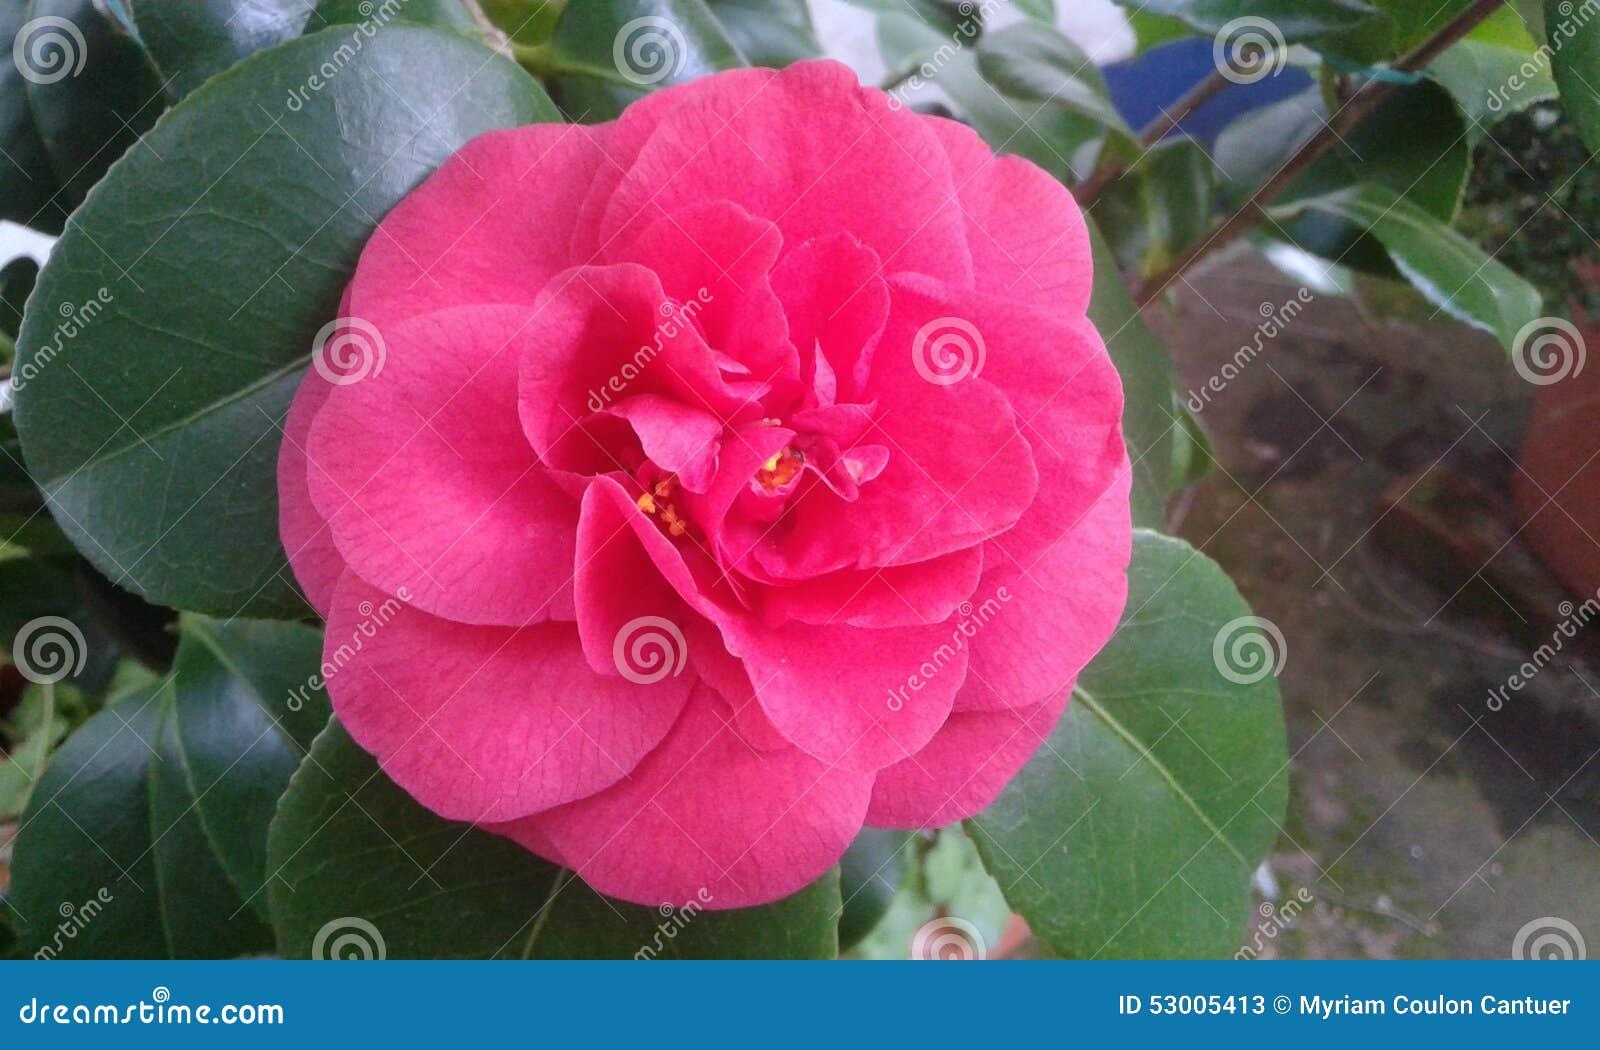 pink gardenia blossom stock photo  image, Beautiful flower